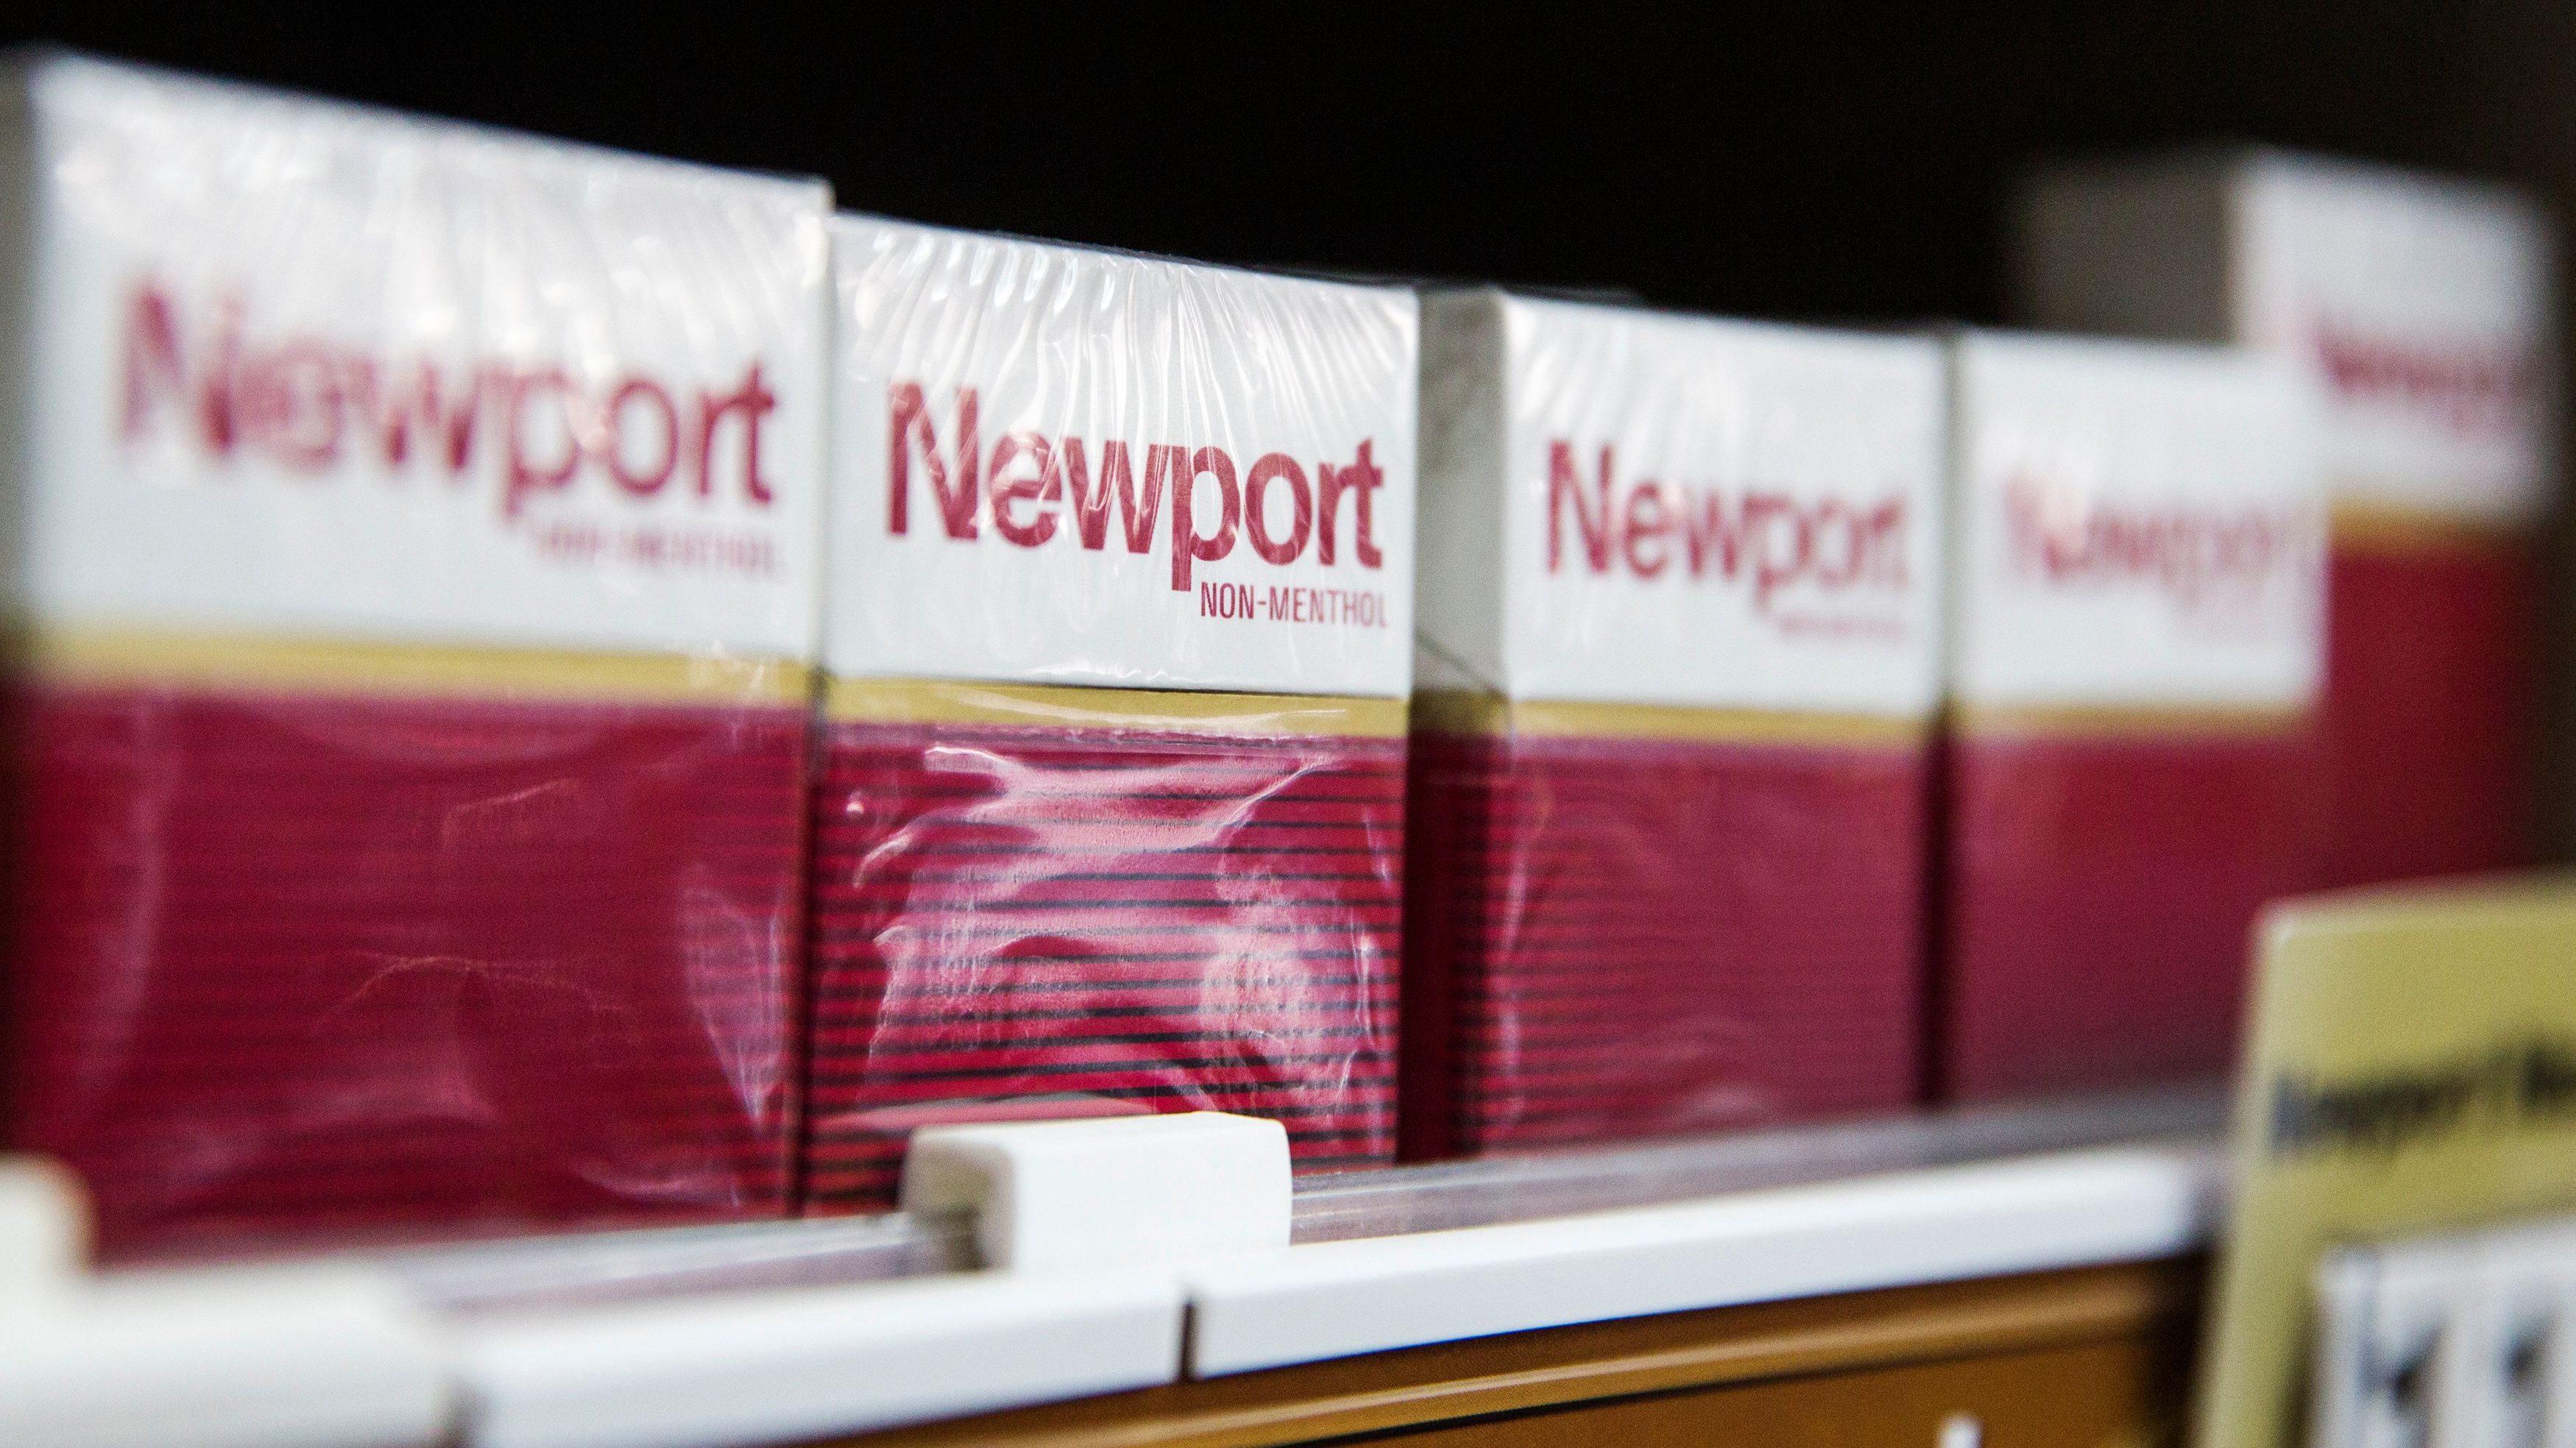 Rumors of a menthol-cigarette ban have pummeled tobacco